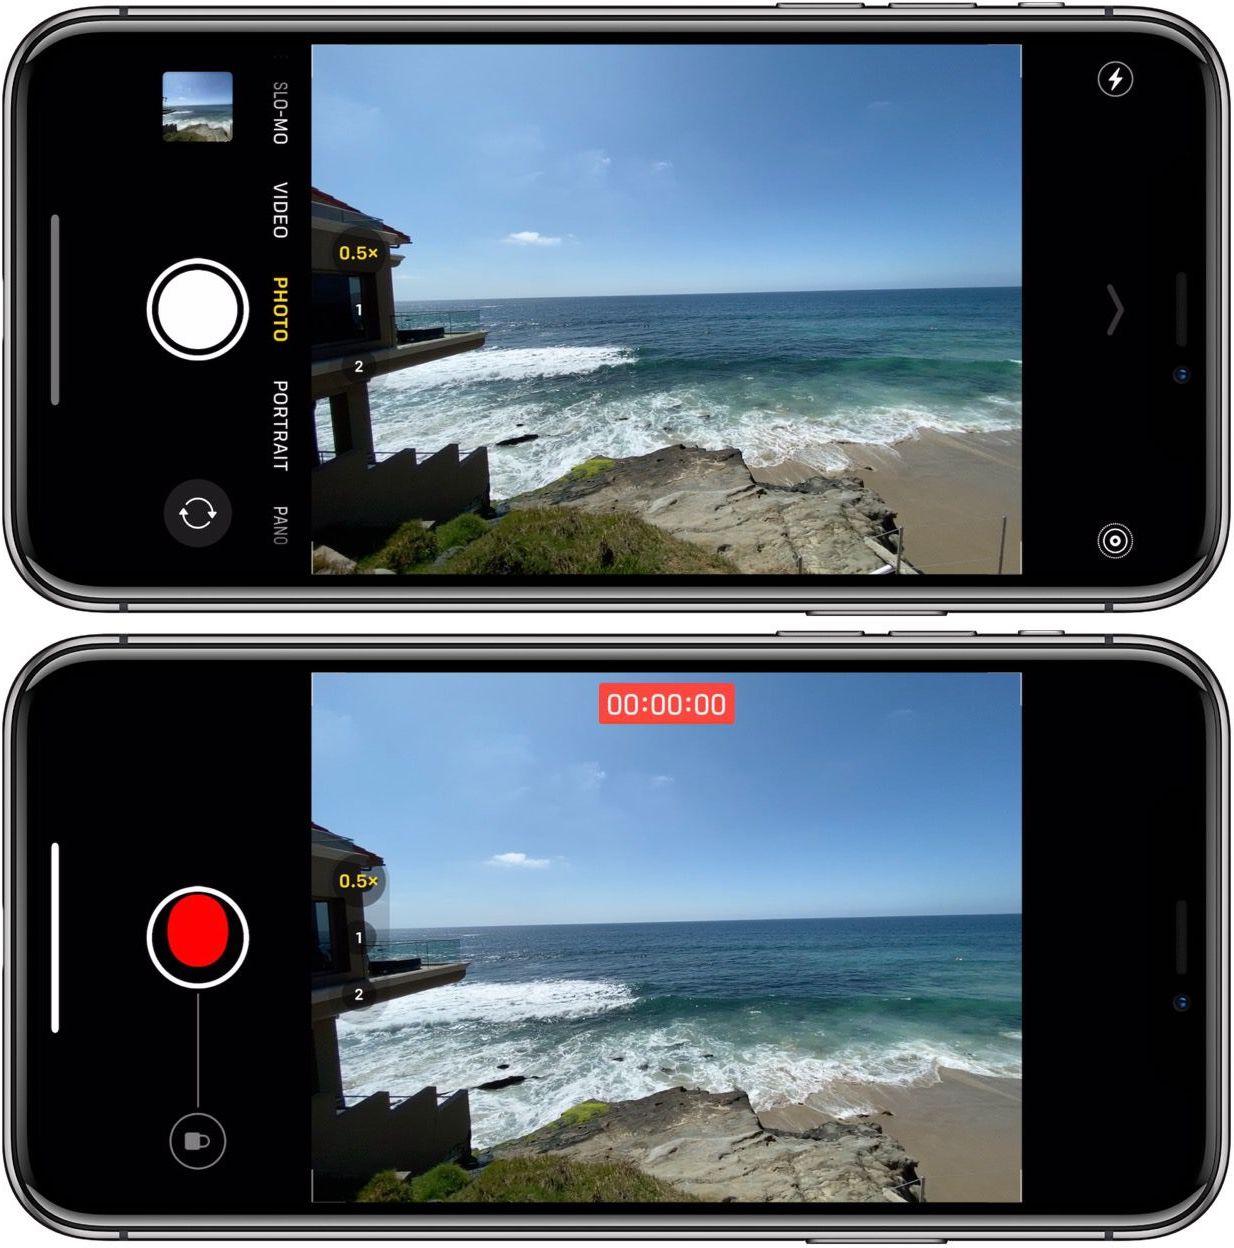 How to use burst mode iPhone 11 camera walkthrough 4